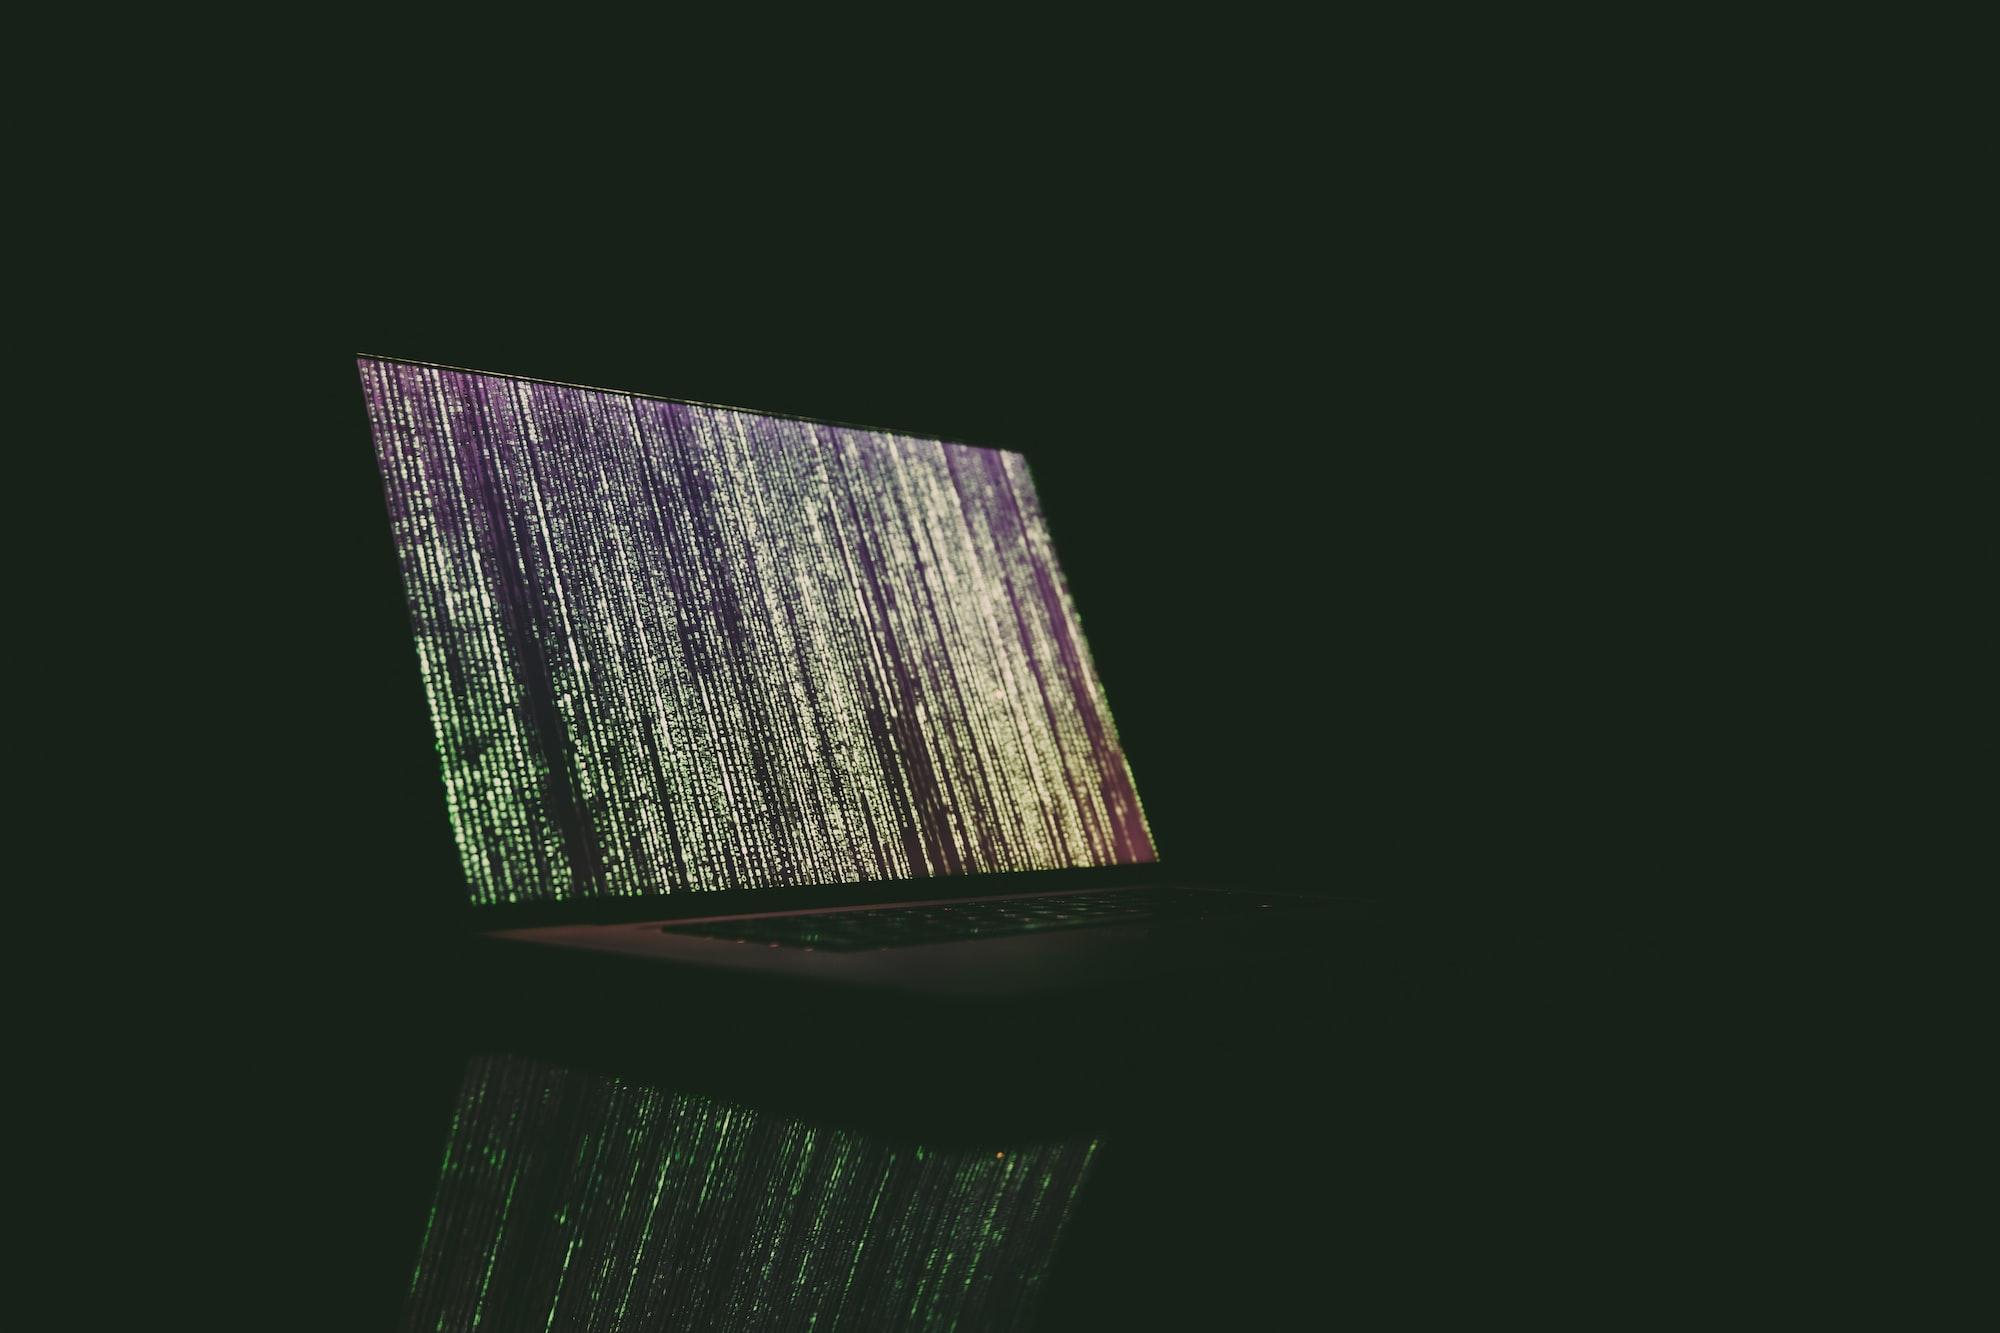 AES 256   Delphi Encryption - PHP Decryption